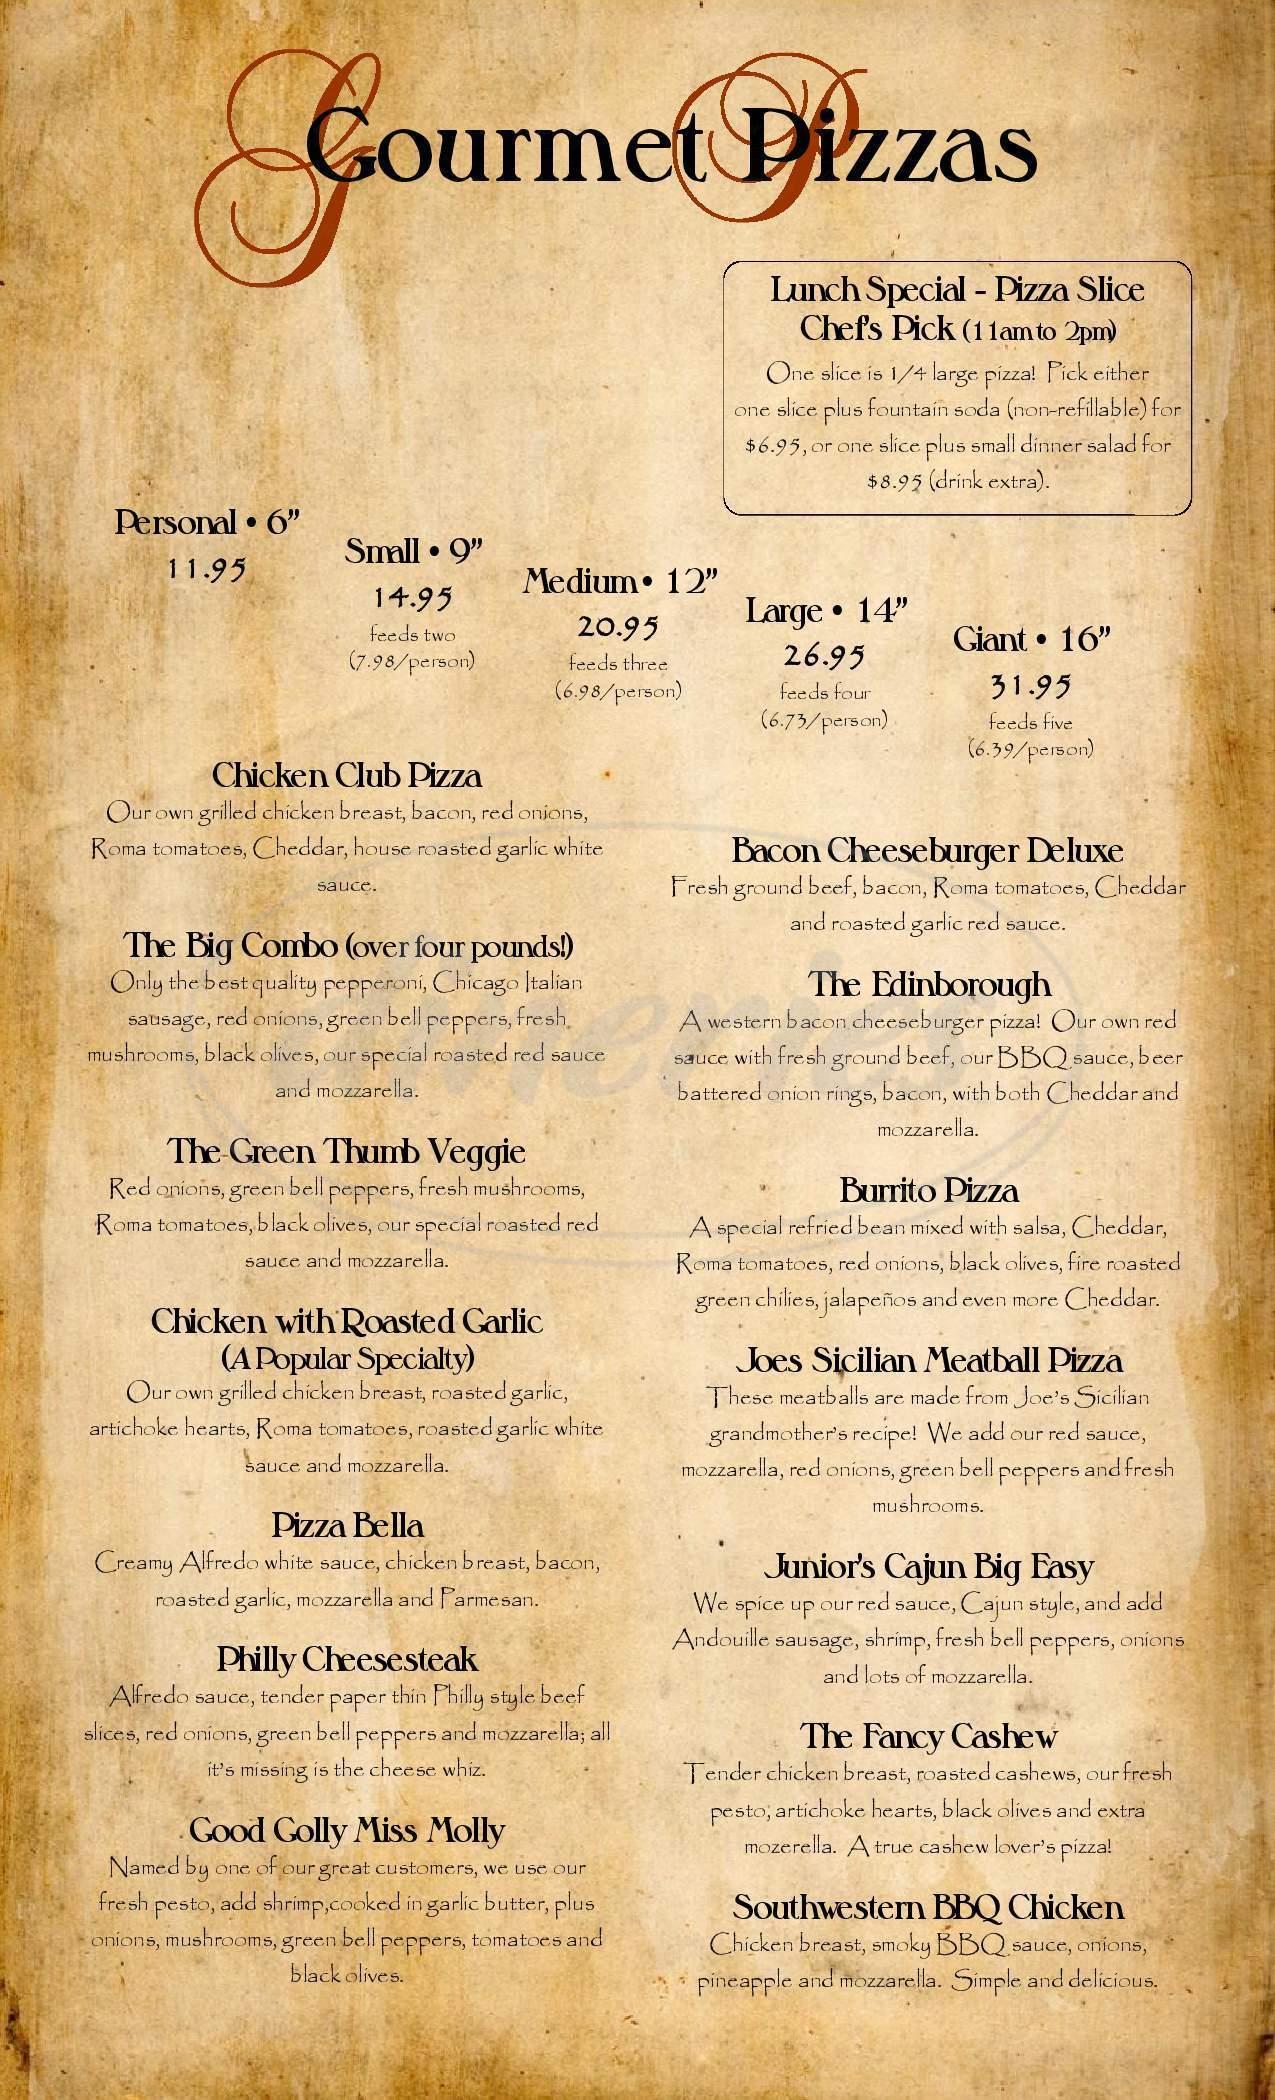 menu for Brugo's Pizza Company and Bistro